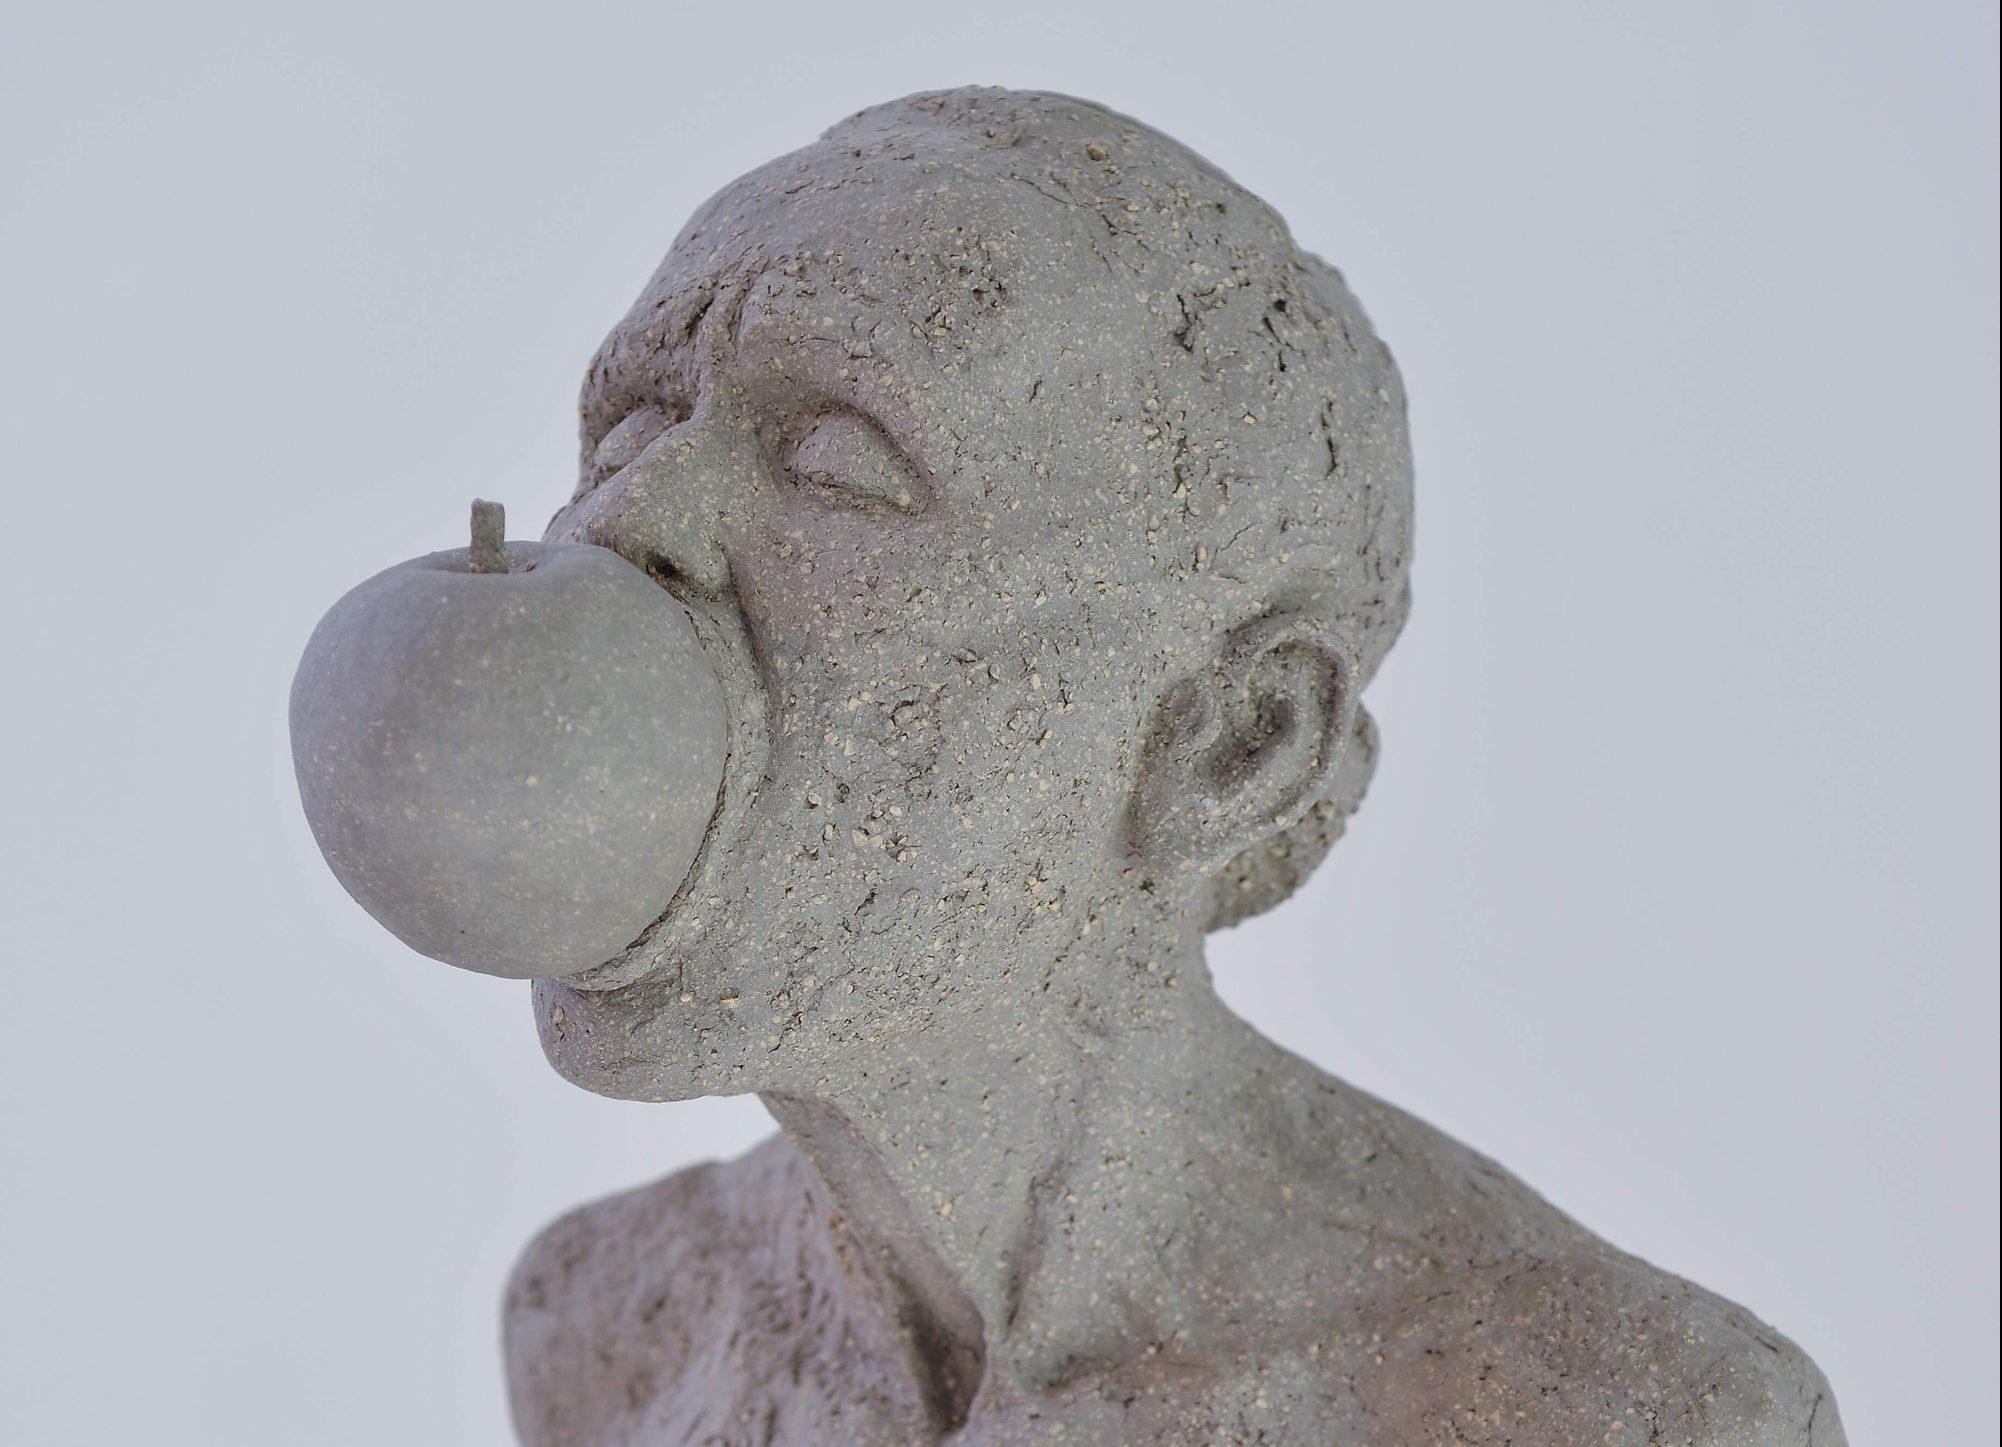 FIGURATIVE SCULPTURE / THE HUMAN HEAD / EVA AVIDAR